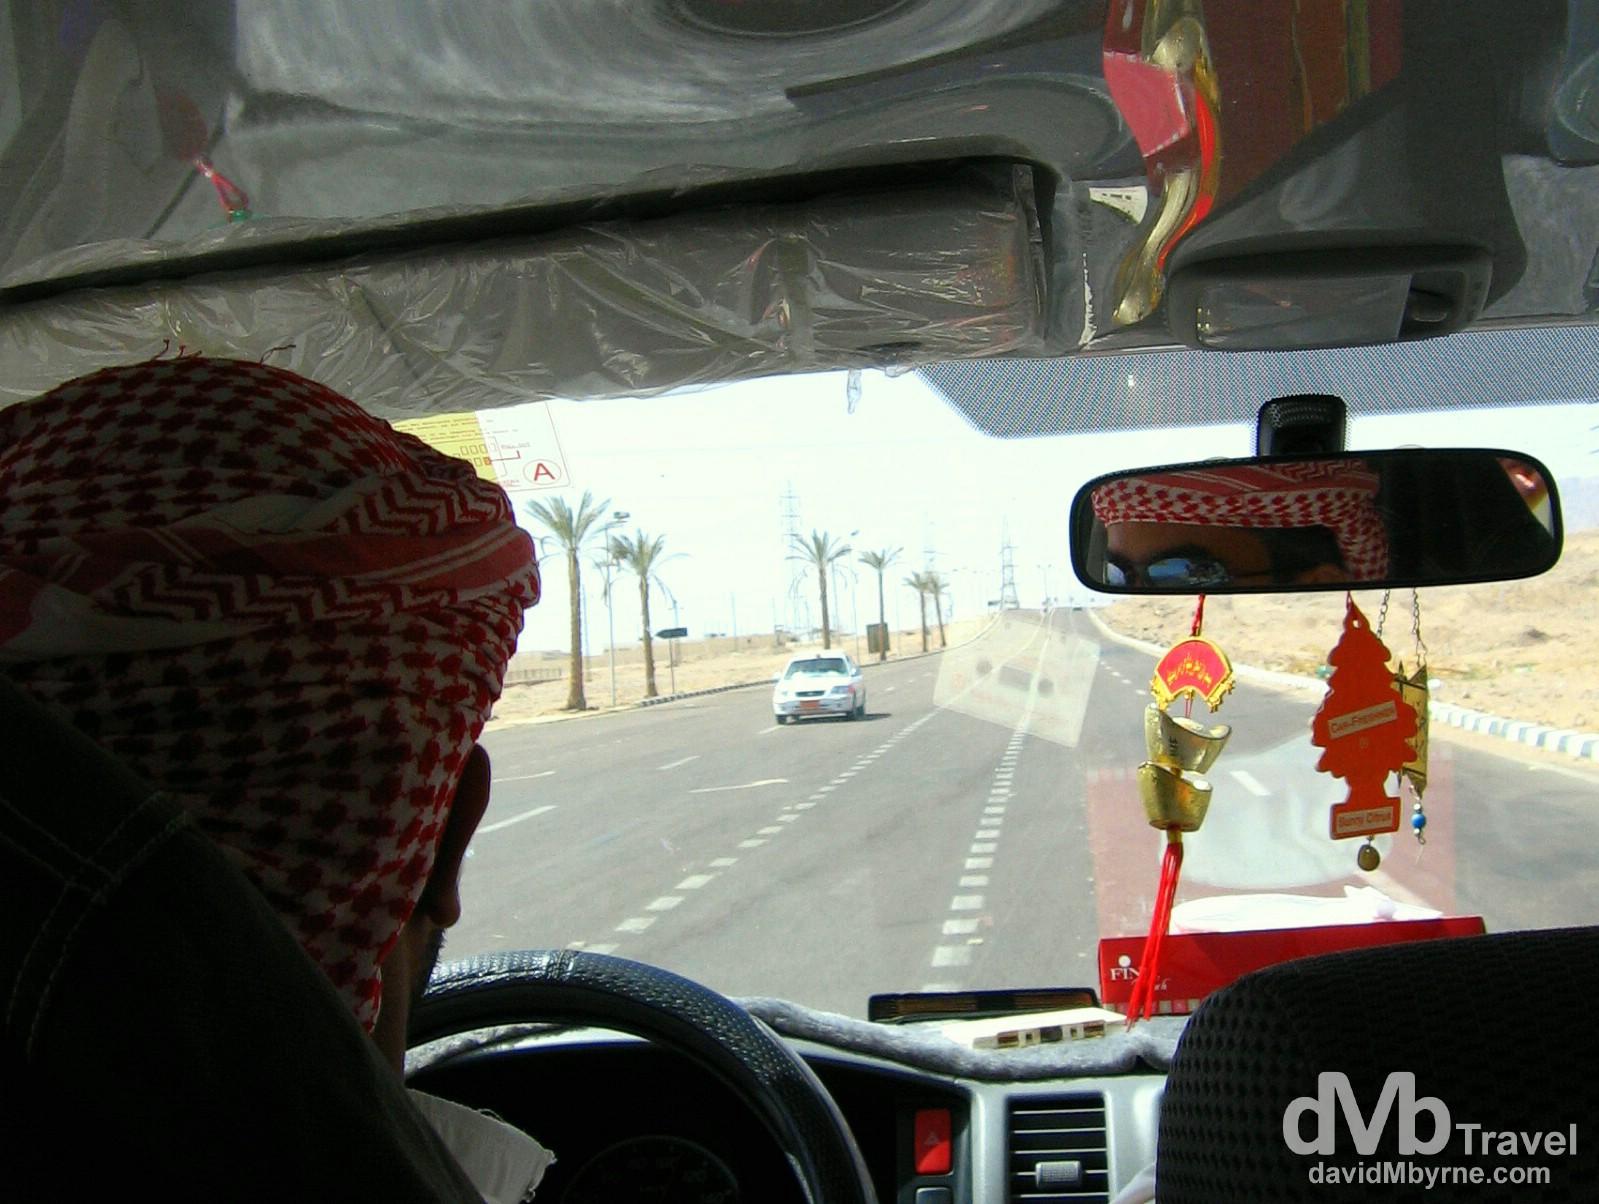 On the road in Nuweiba, Sinai Peninsula, Egypt. April 24, 2008.